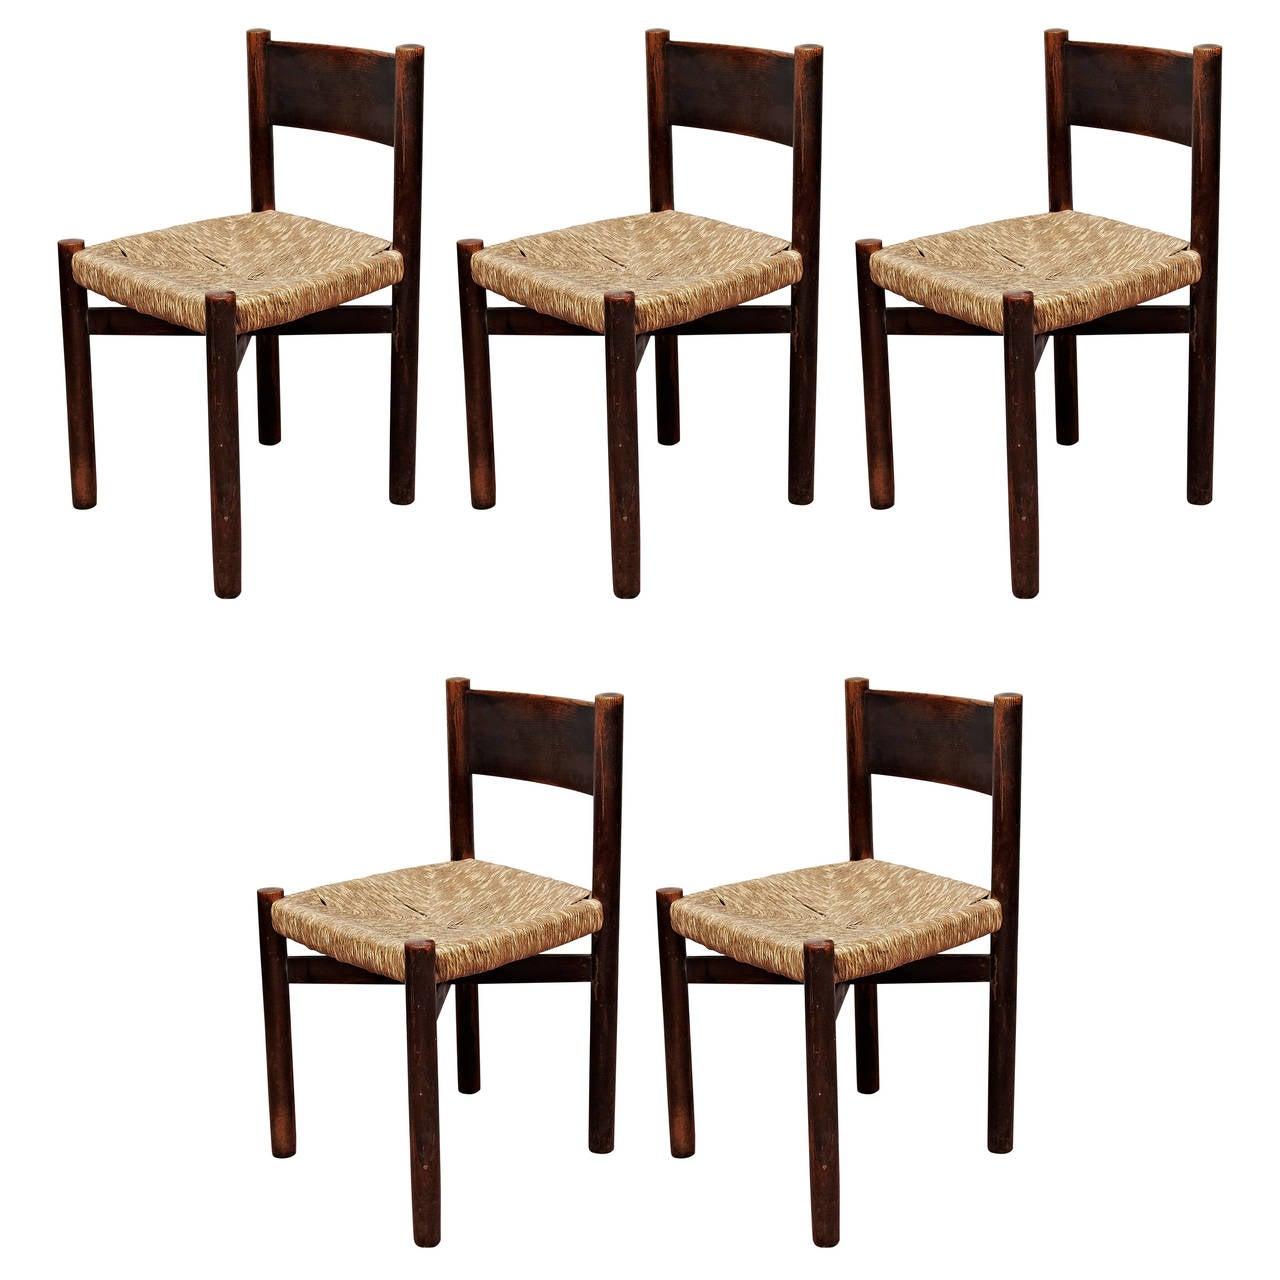 Set of Five Charlotte Perriand Meribel Chair, circa 1950 For Sale